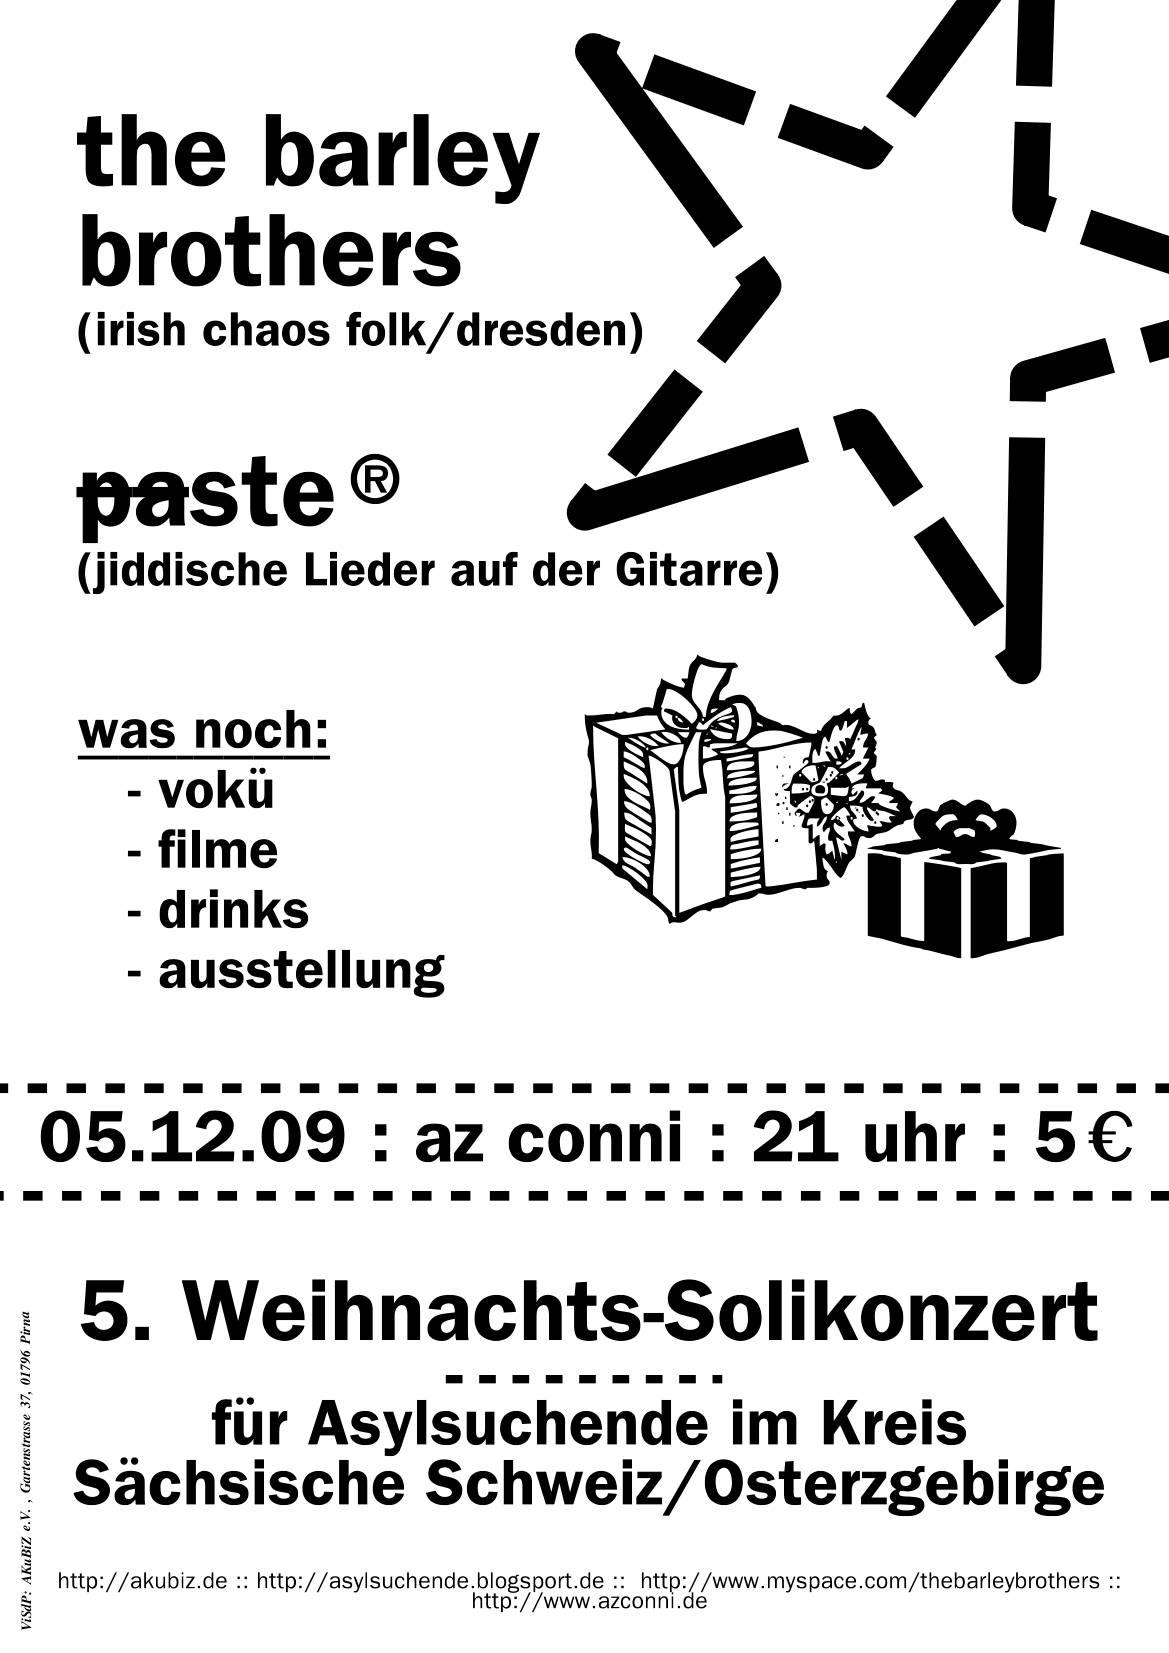 Solikonzert-Plakat